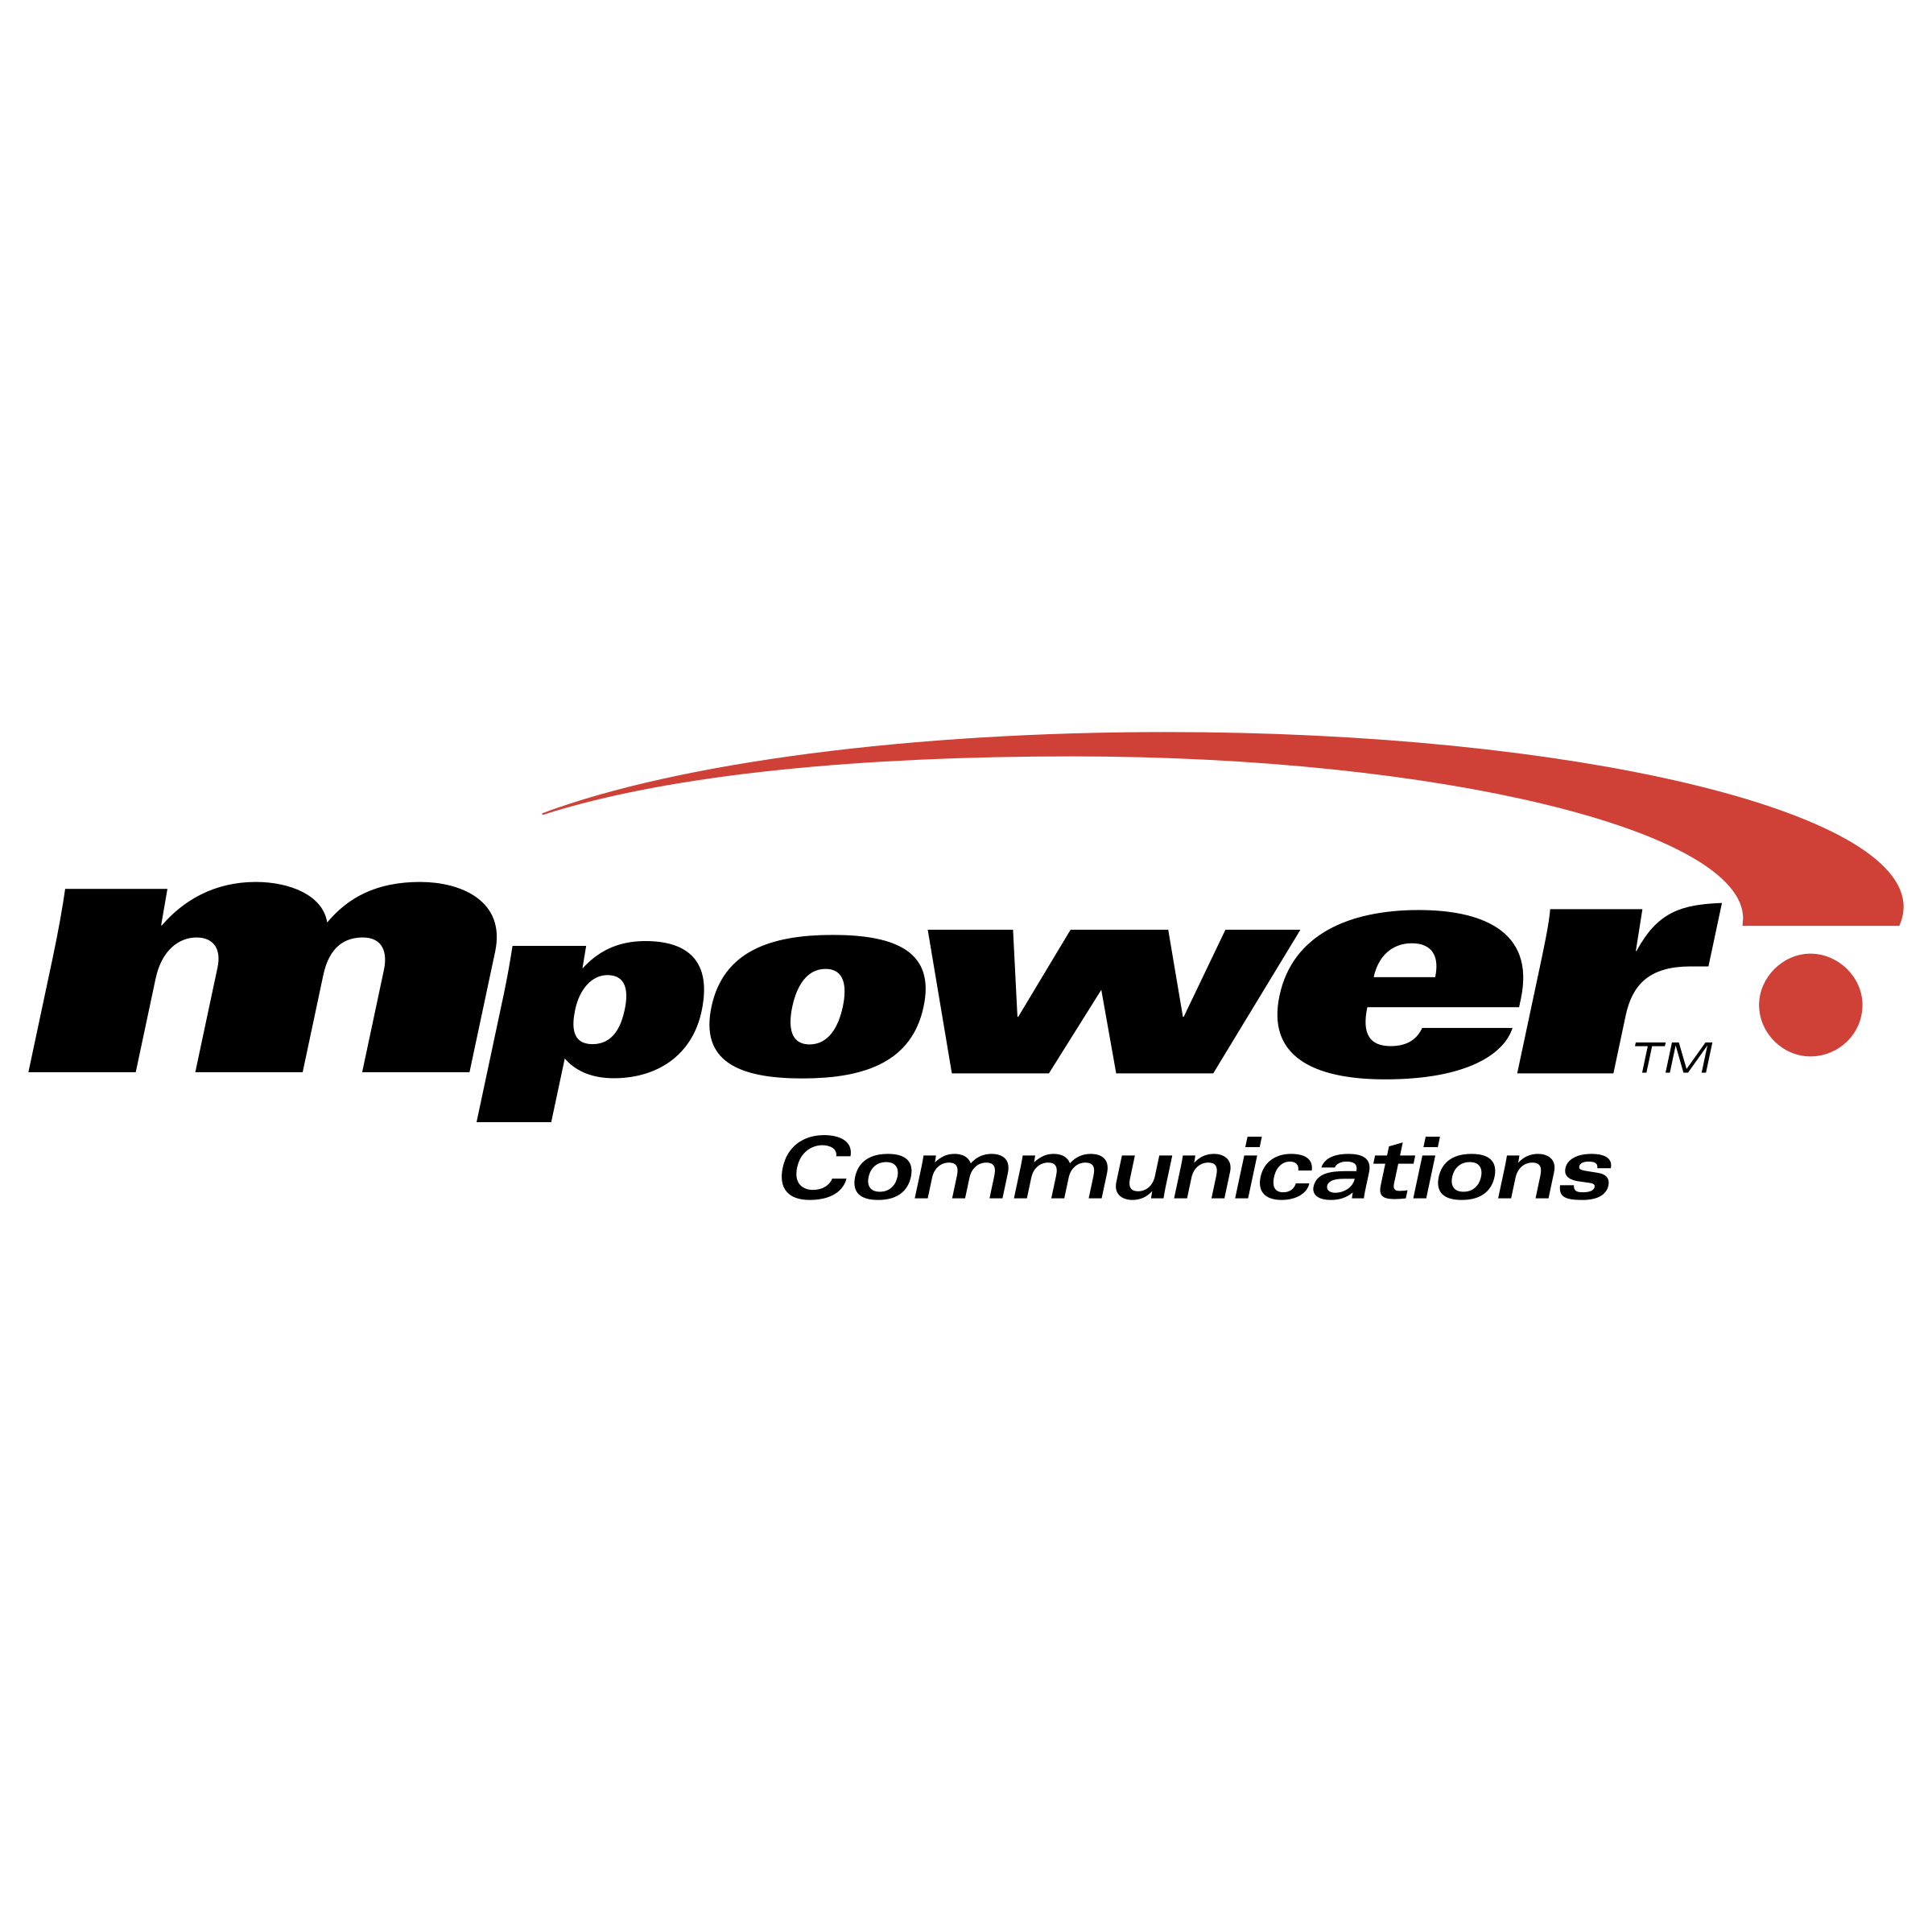 Mpower Communications Logo PNG Transparent & SVG Vector.